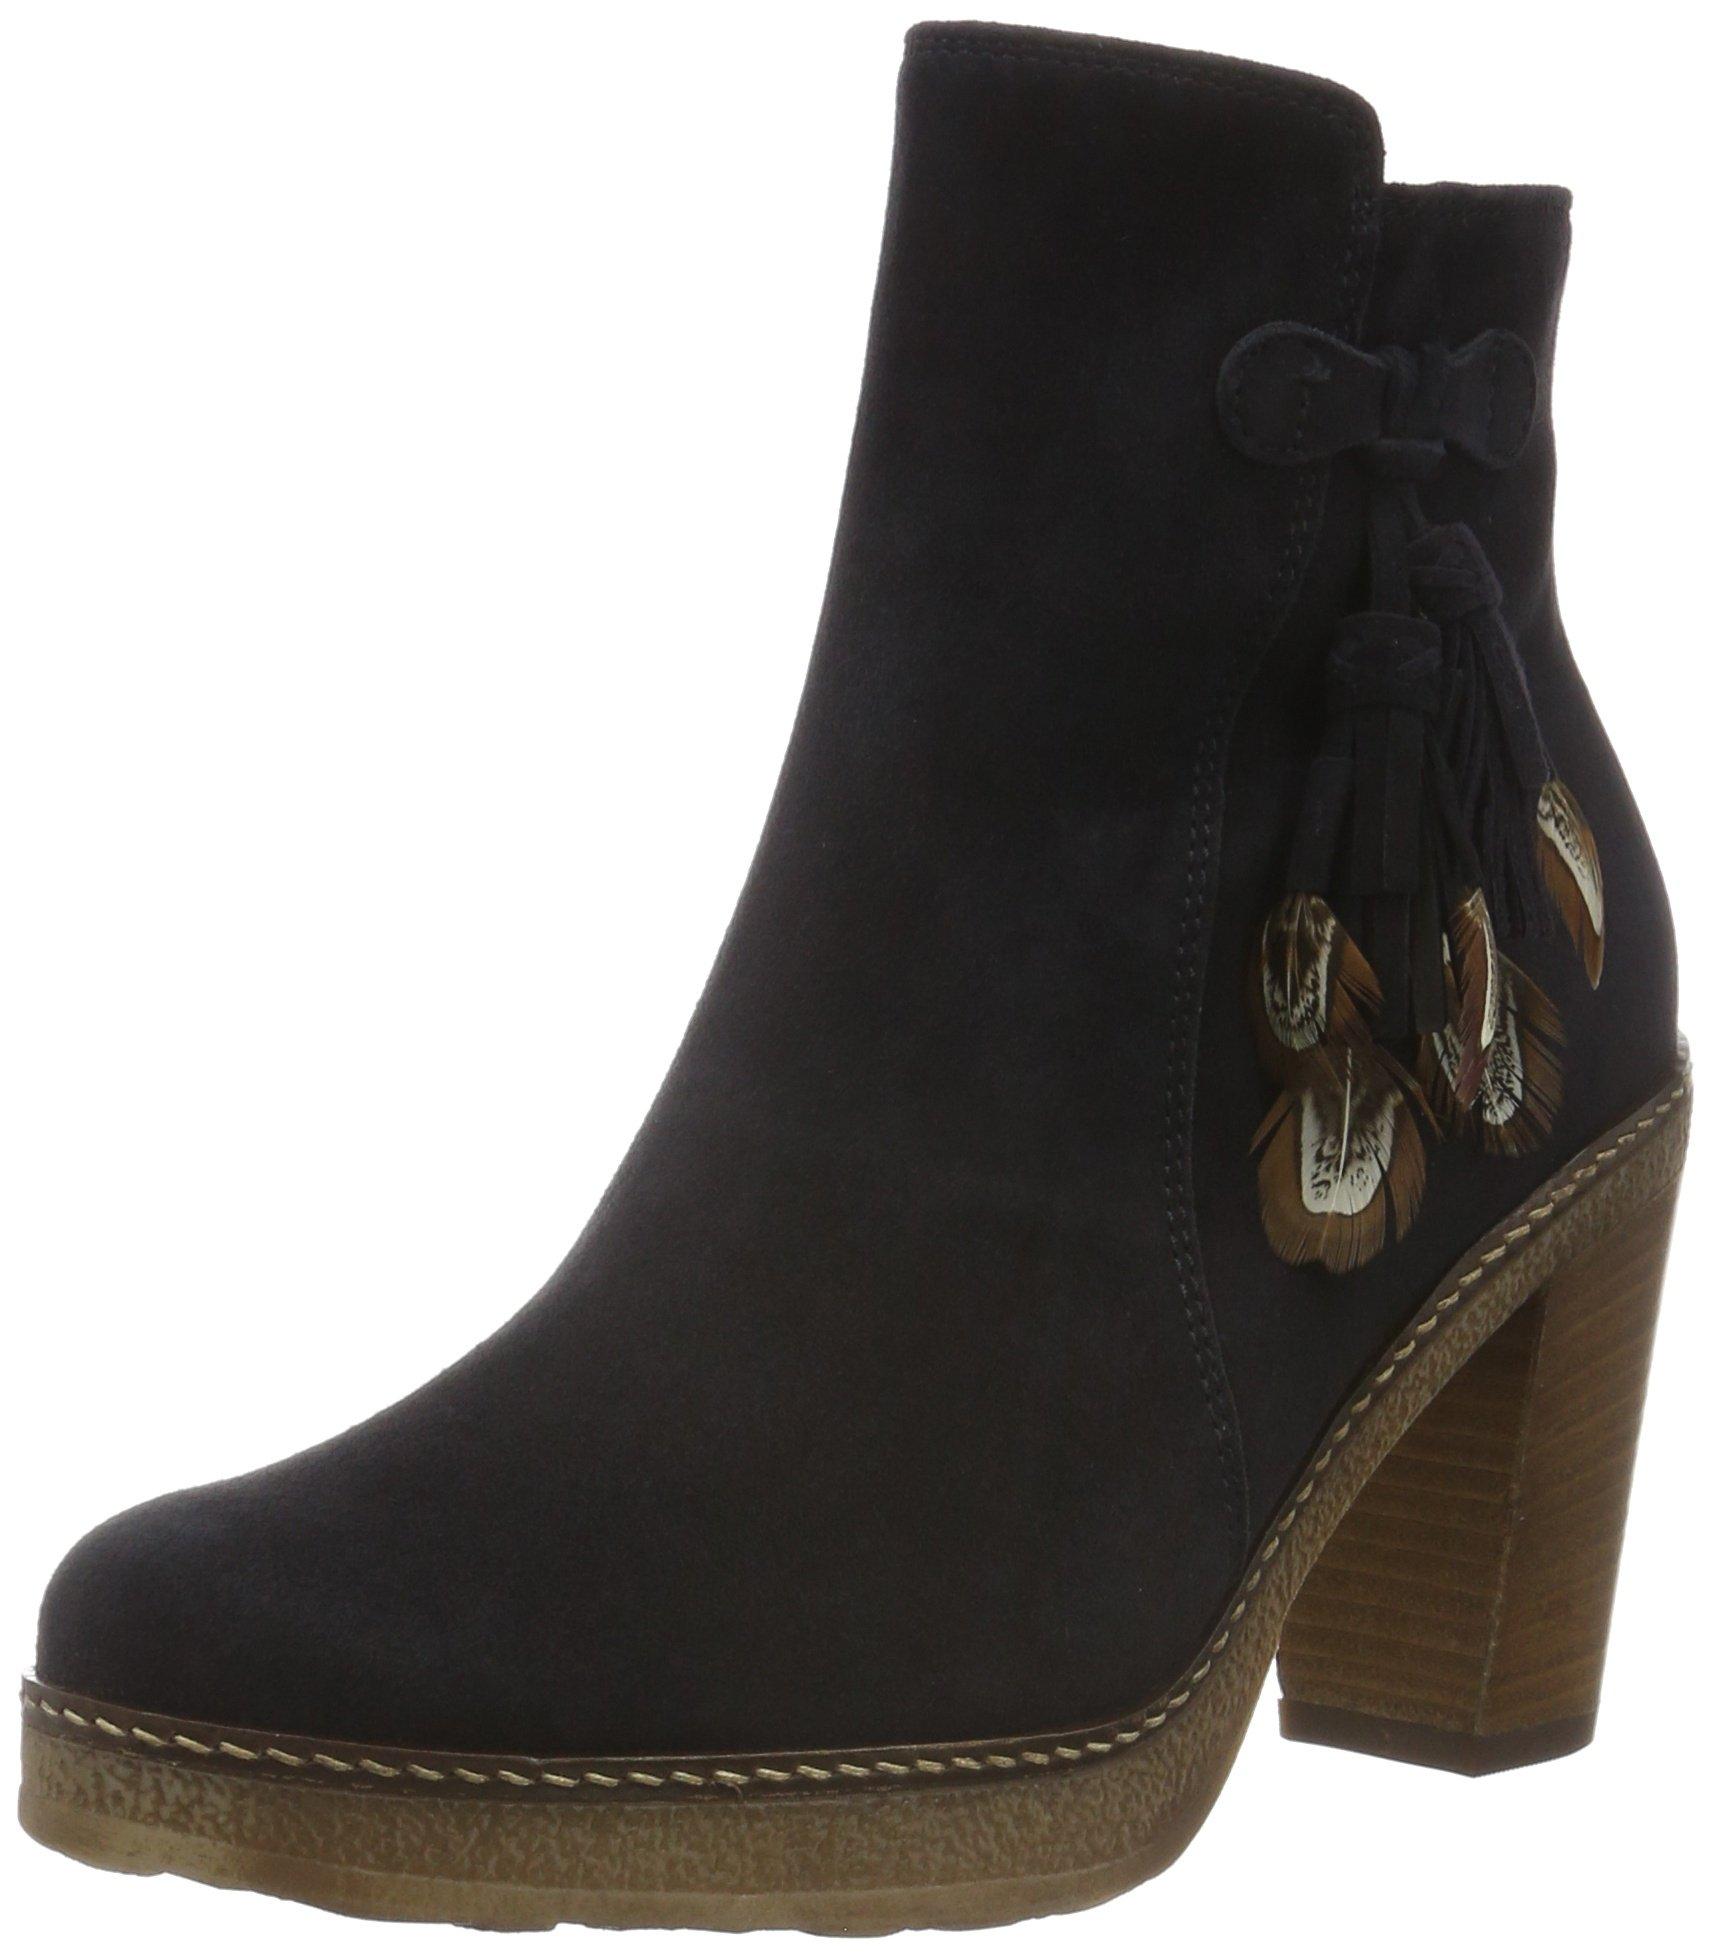 Santiags Eu Shoes FemmeBleu40 720 55 Gabor 0XOPwnk8